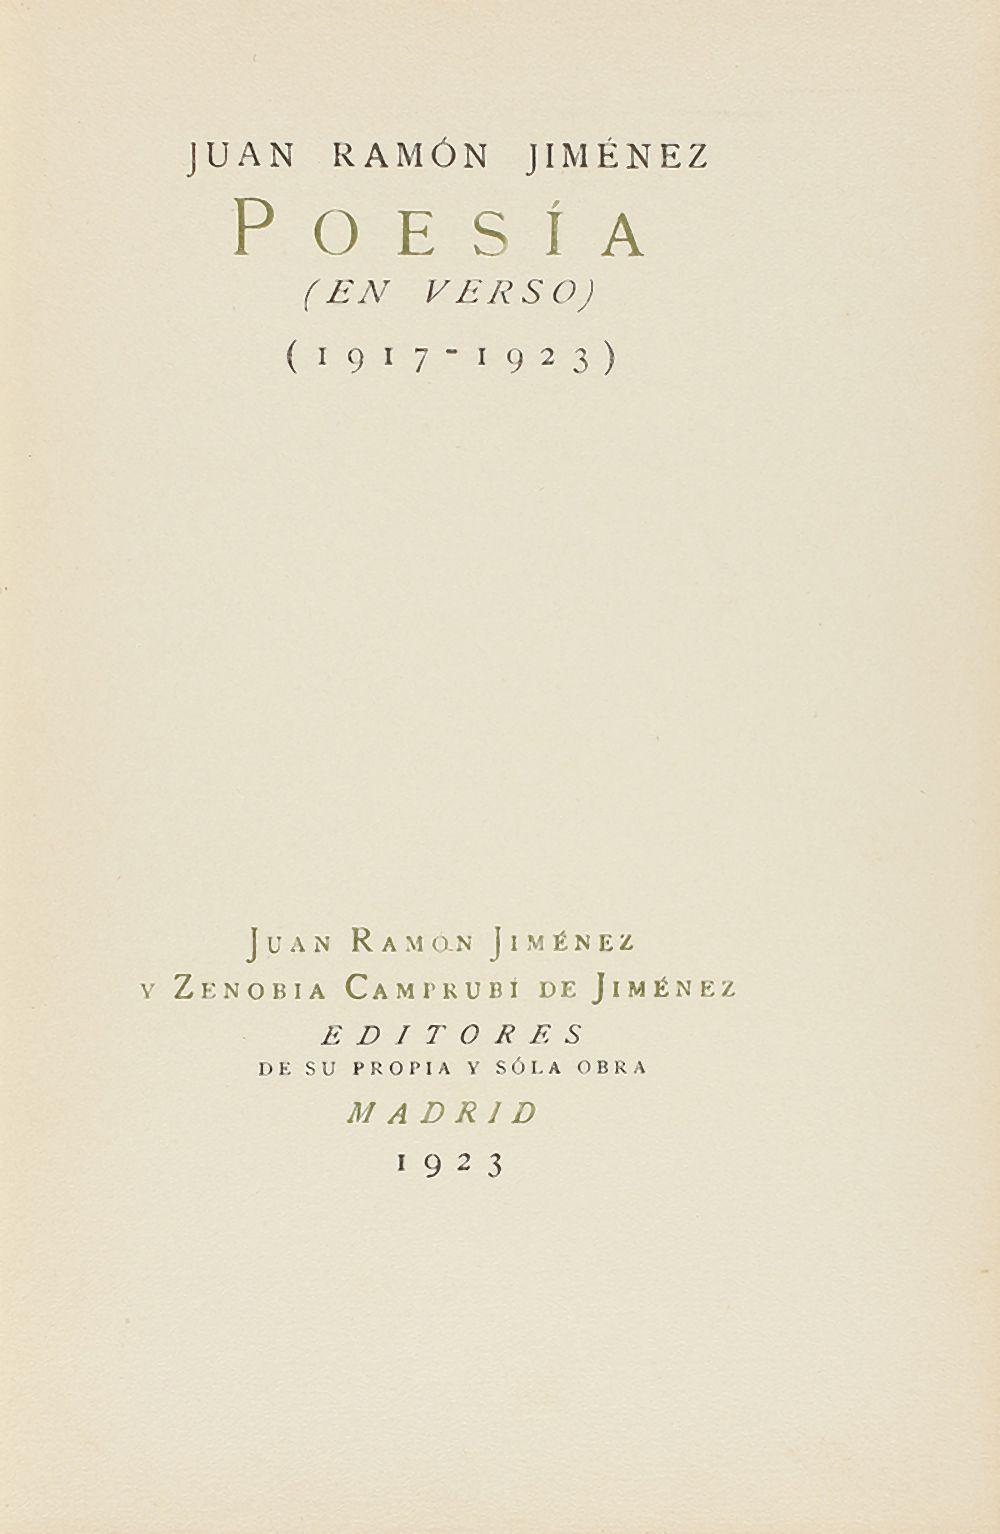 1923. LIBRO: (LITERATURA-MODERNISMO). JIMENEZ, JUAN RAMÓN: POESIA (EN VERSO) (1917-1923). Madrid: Ju